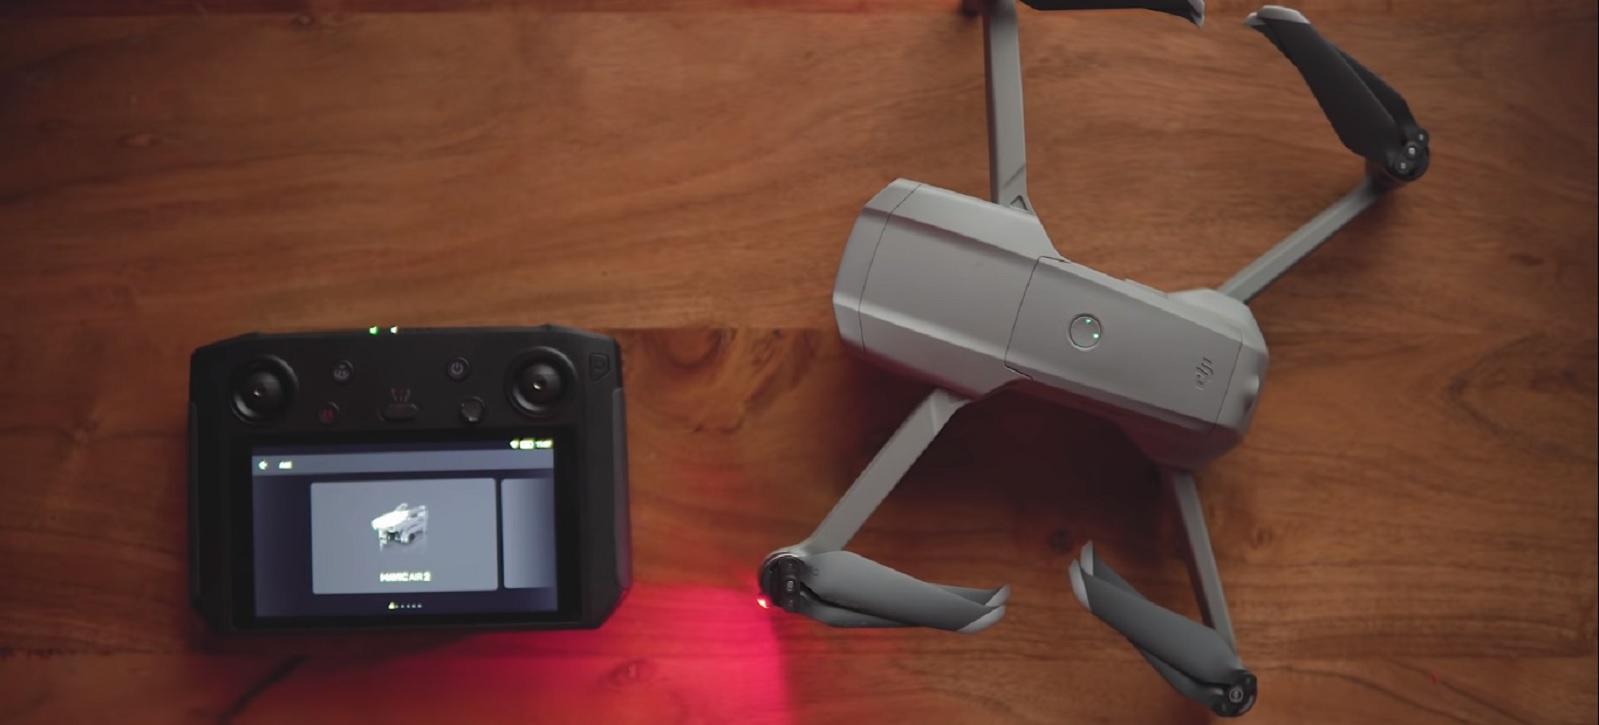 Обновление прошивки DJI Smart Controller – v01.00.0820 – добавлен Mavic Air 2!